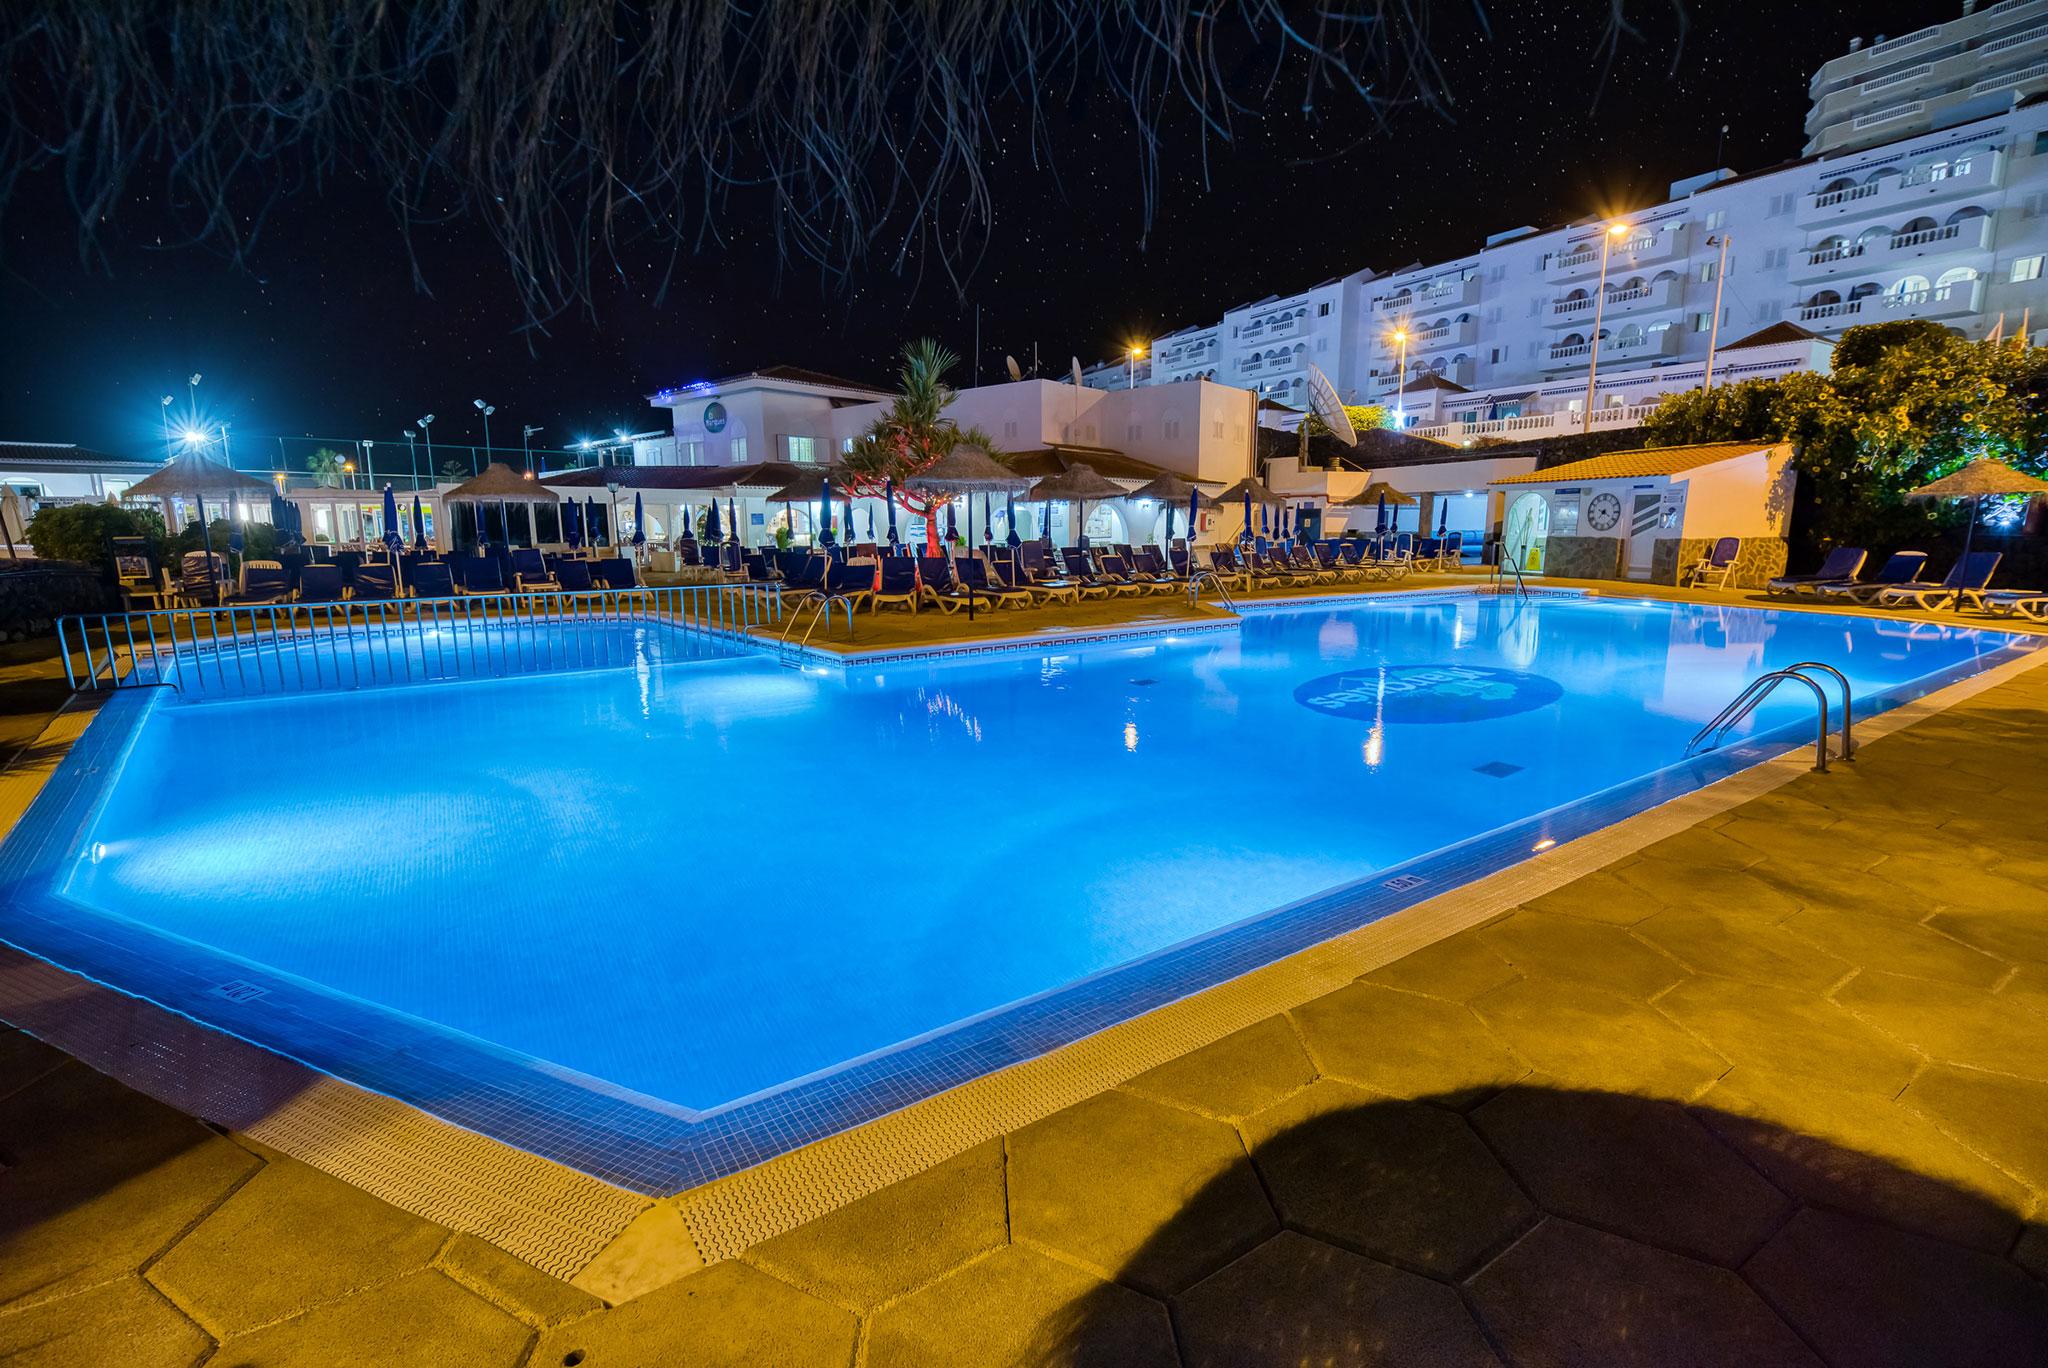 el-marques-night-pool